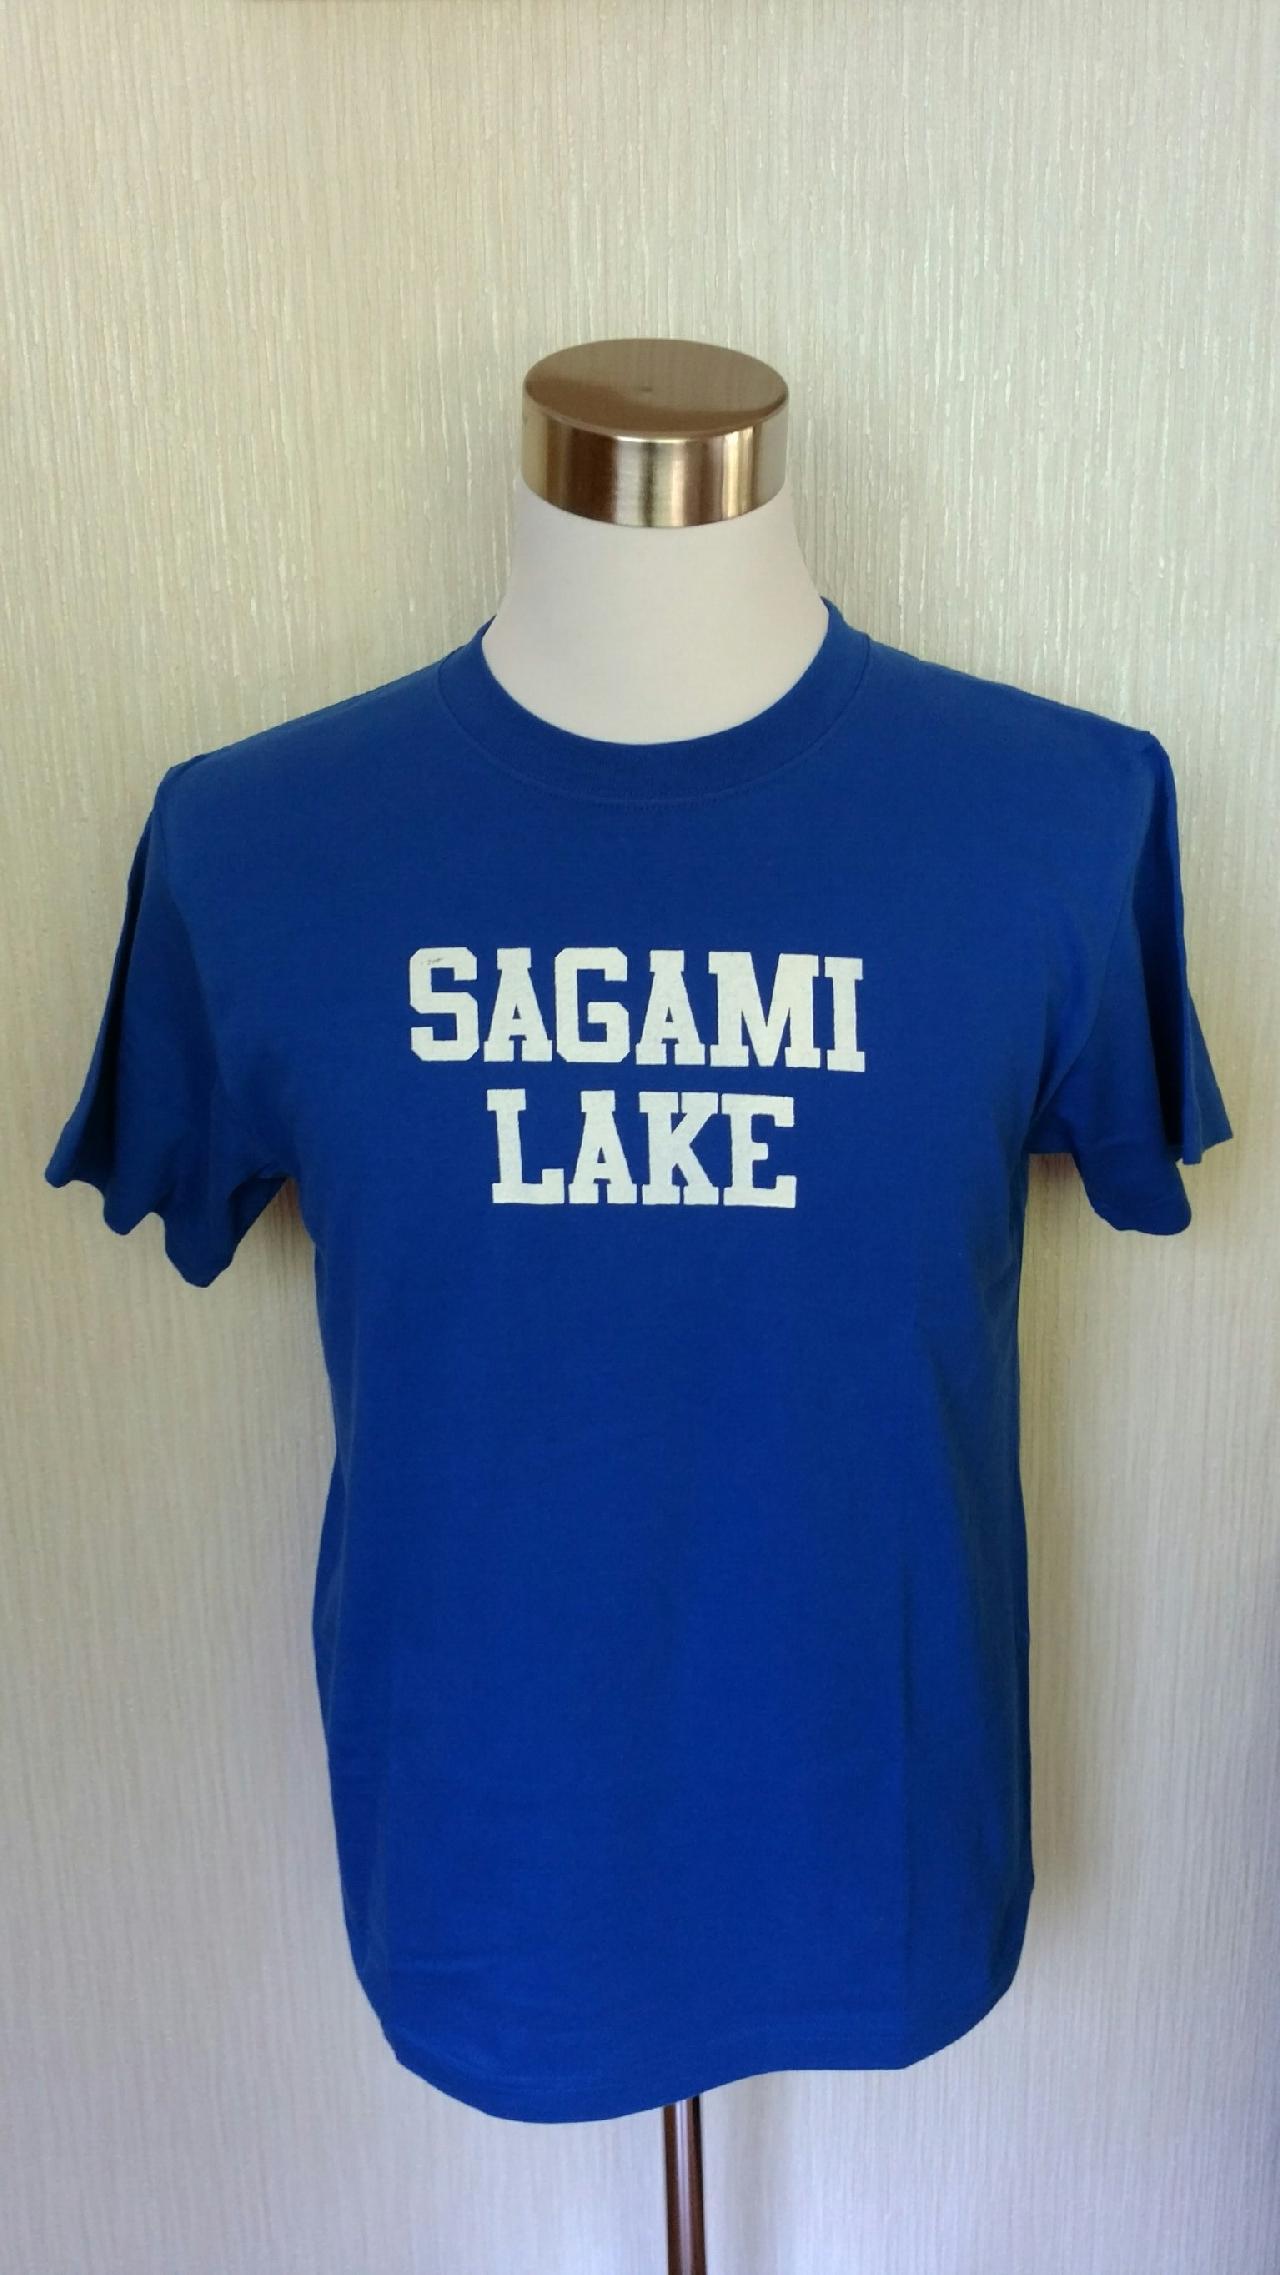 SAGAMI LAKE